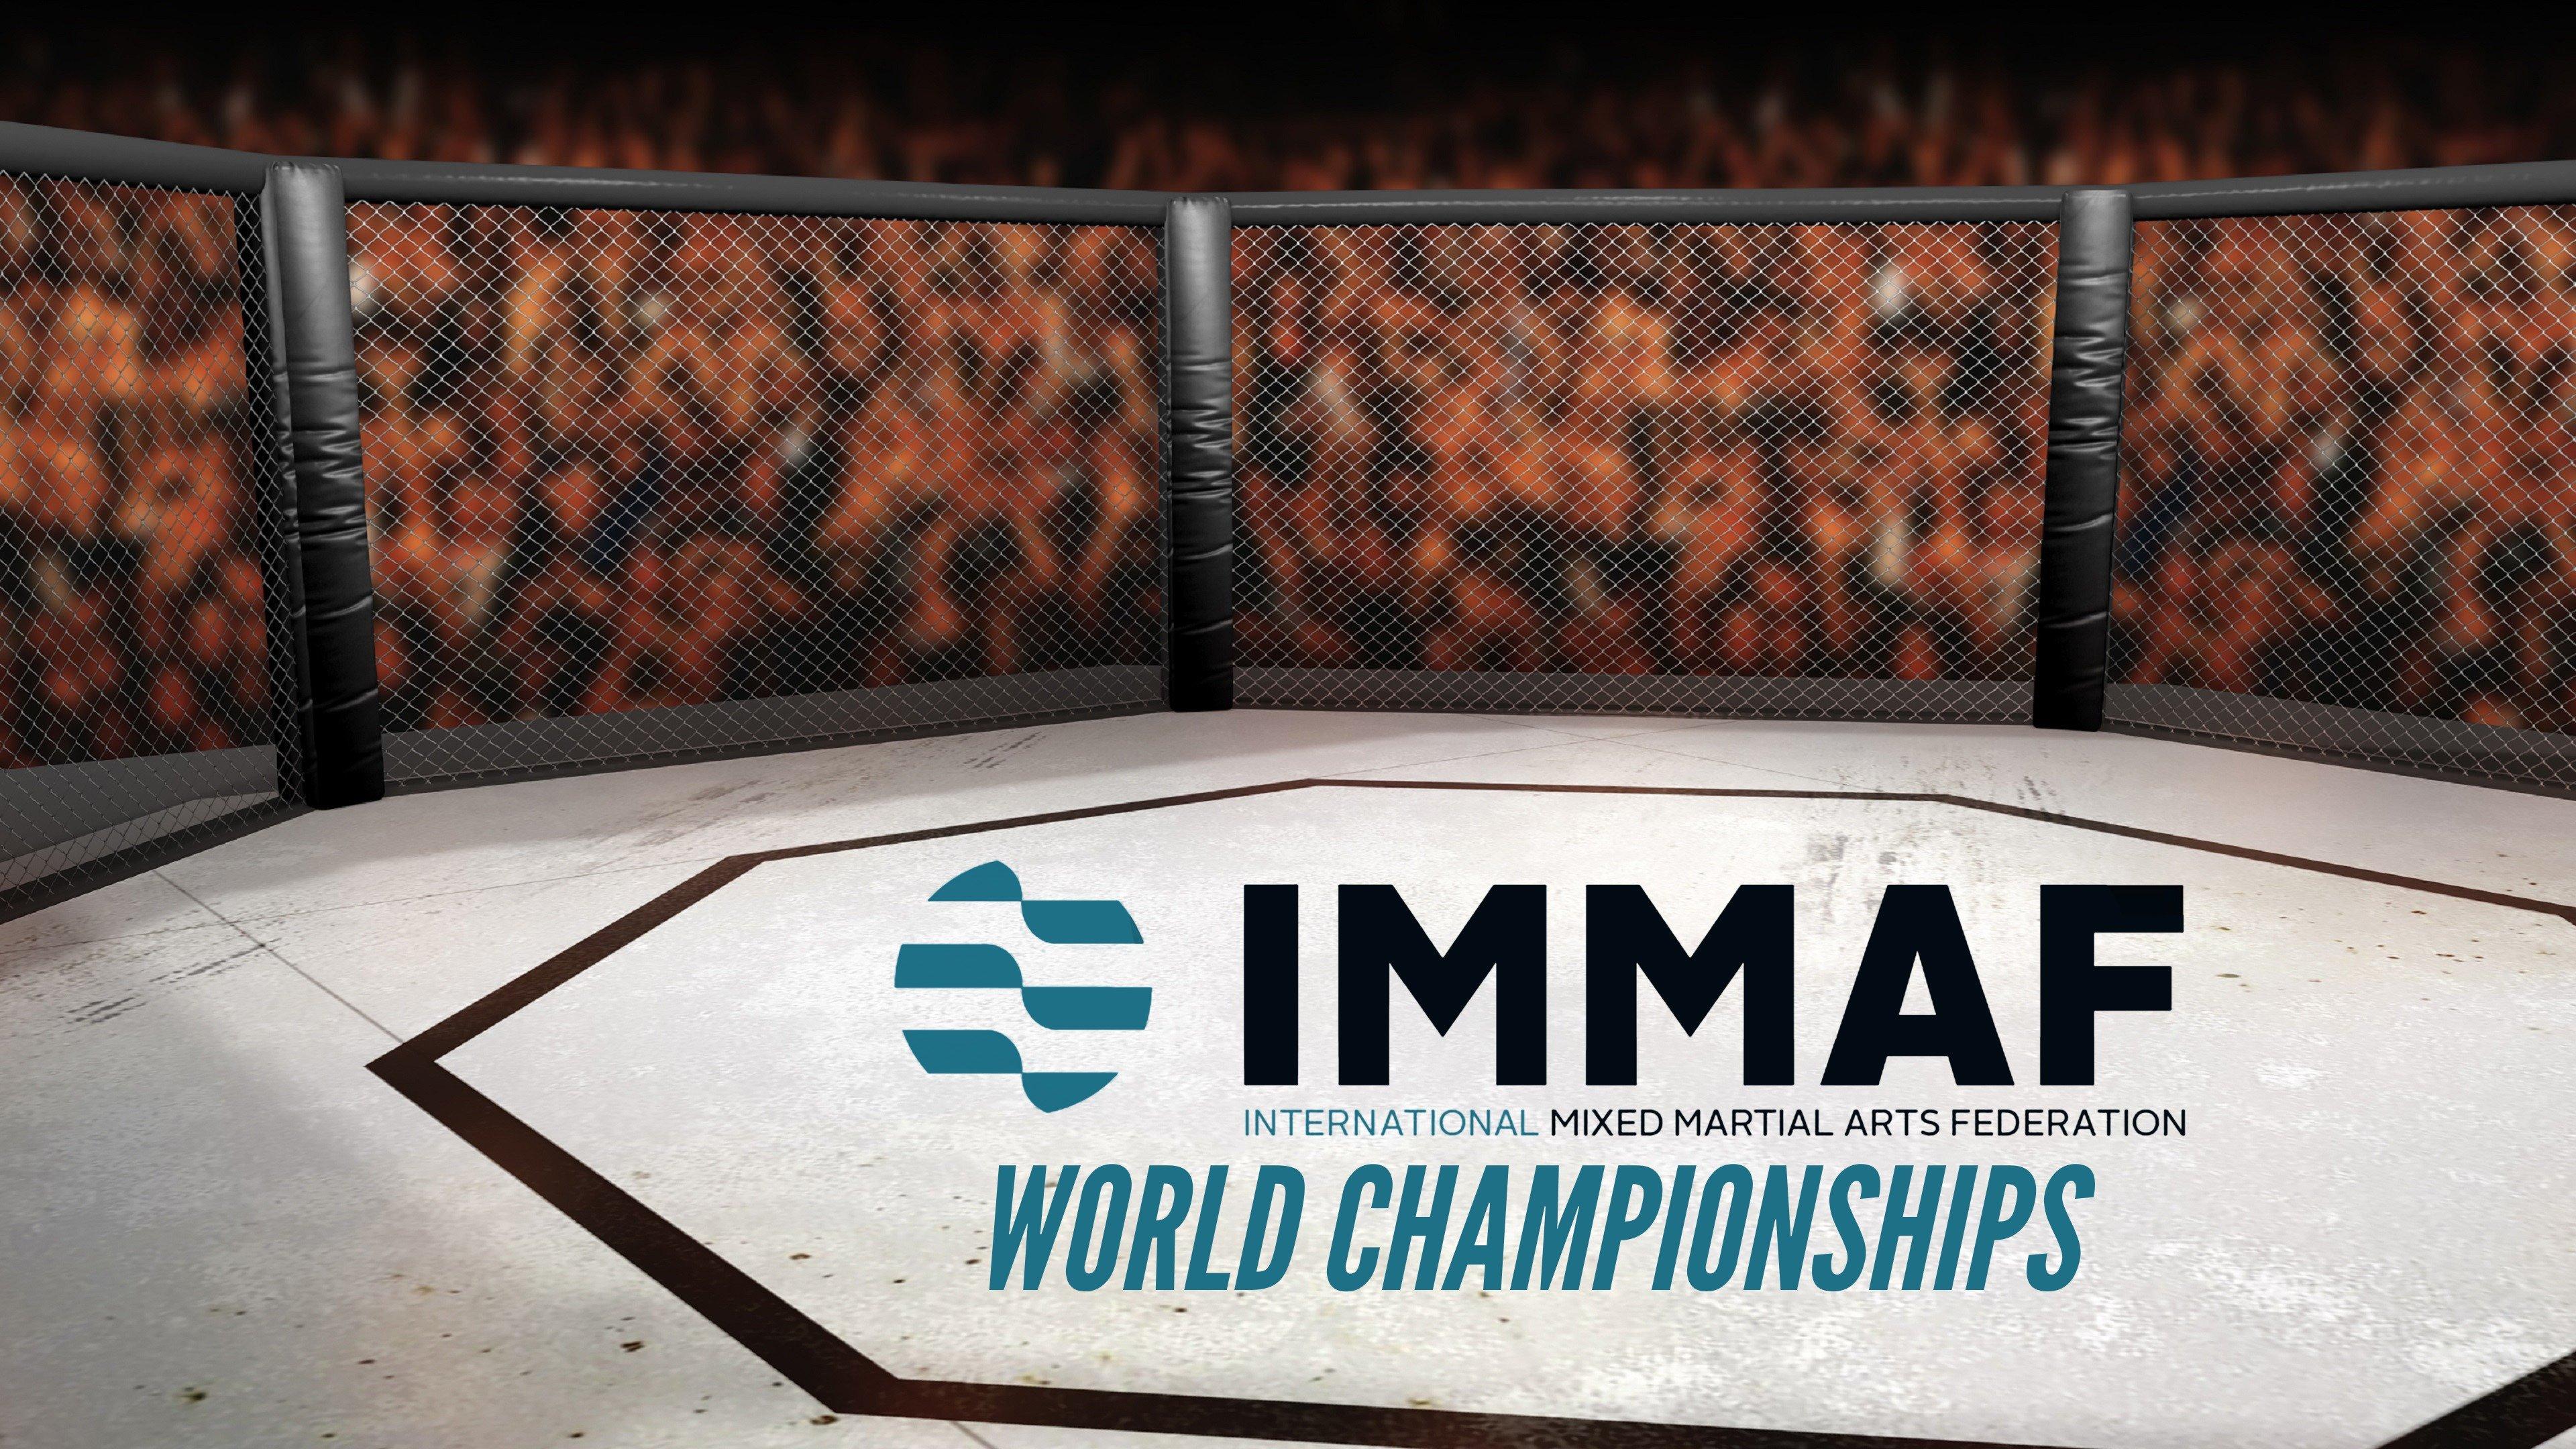 IMMAF World Championships